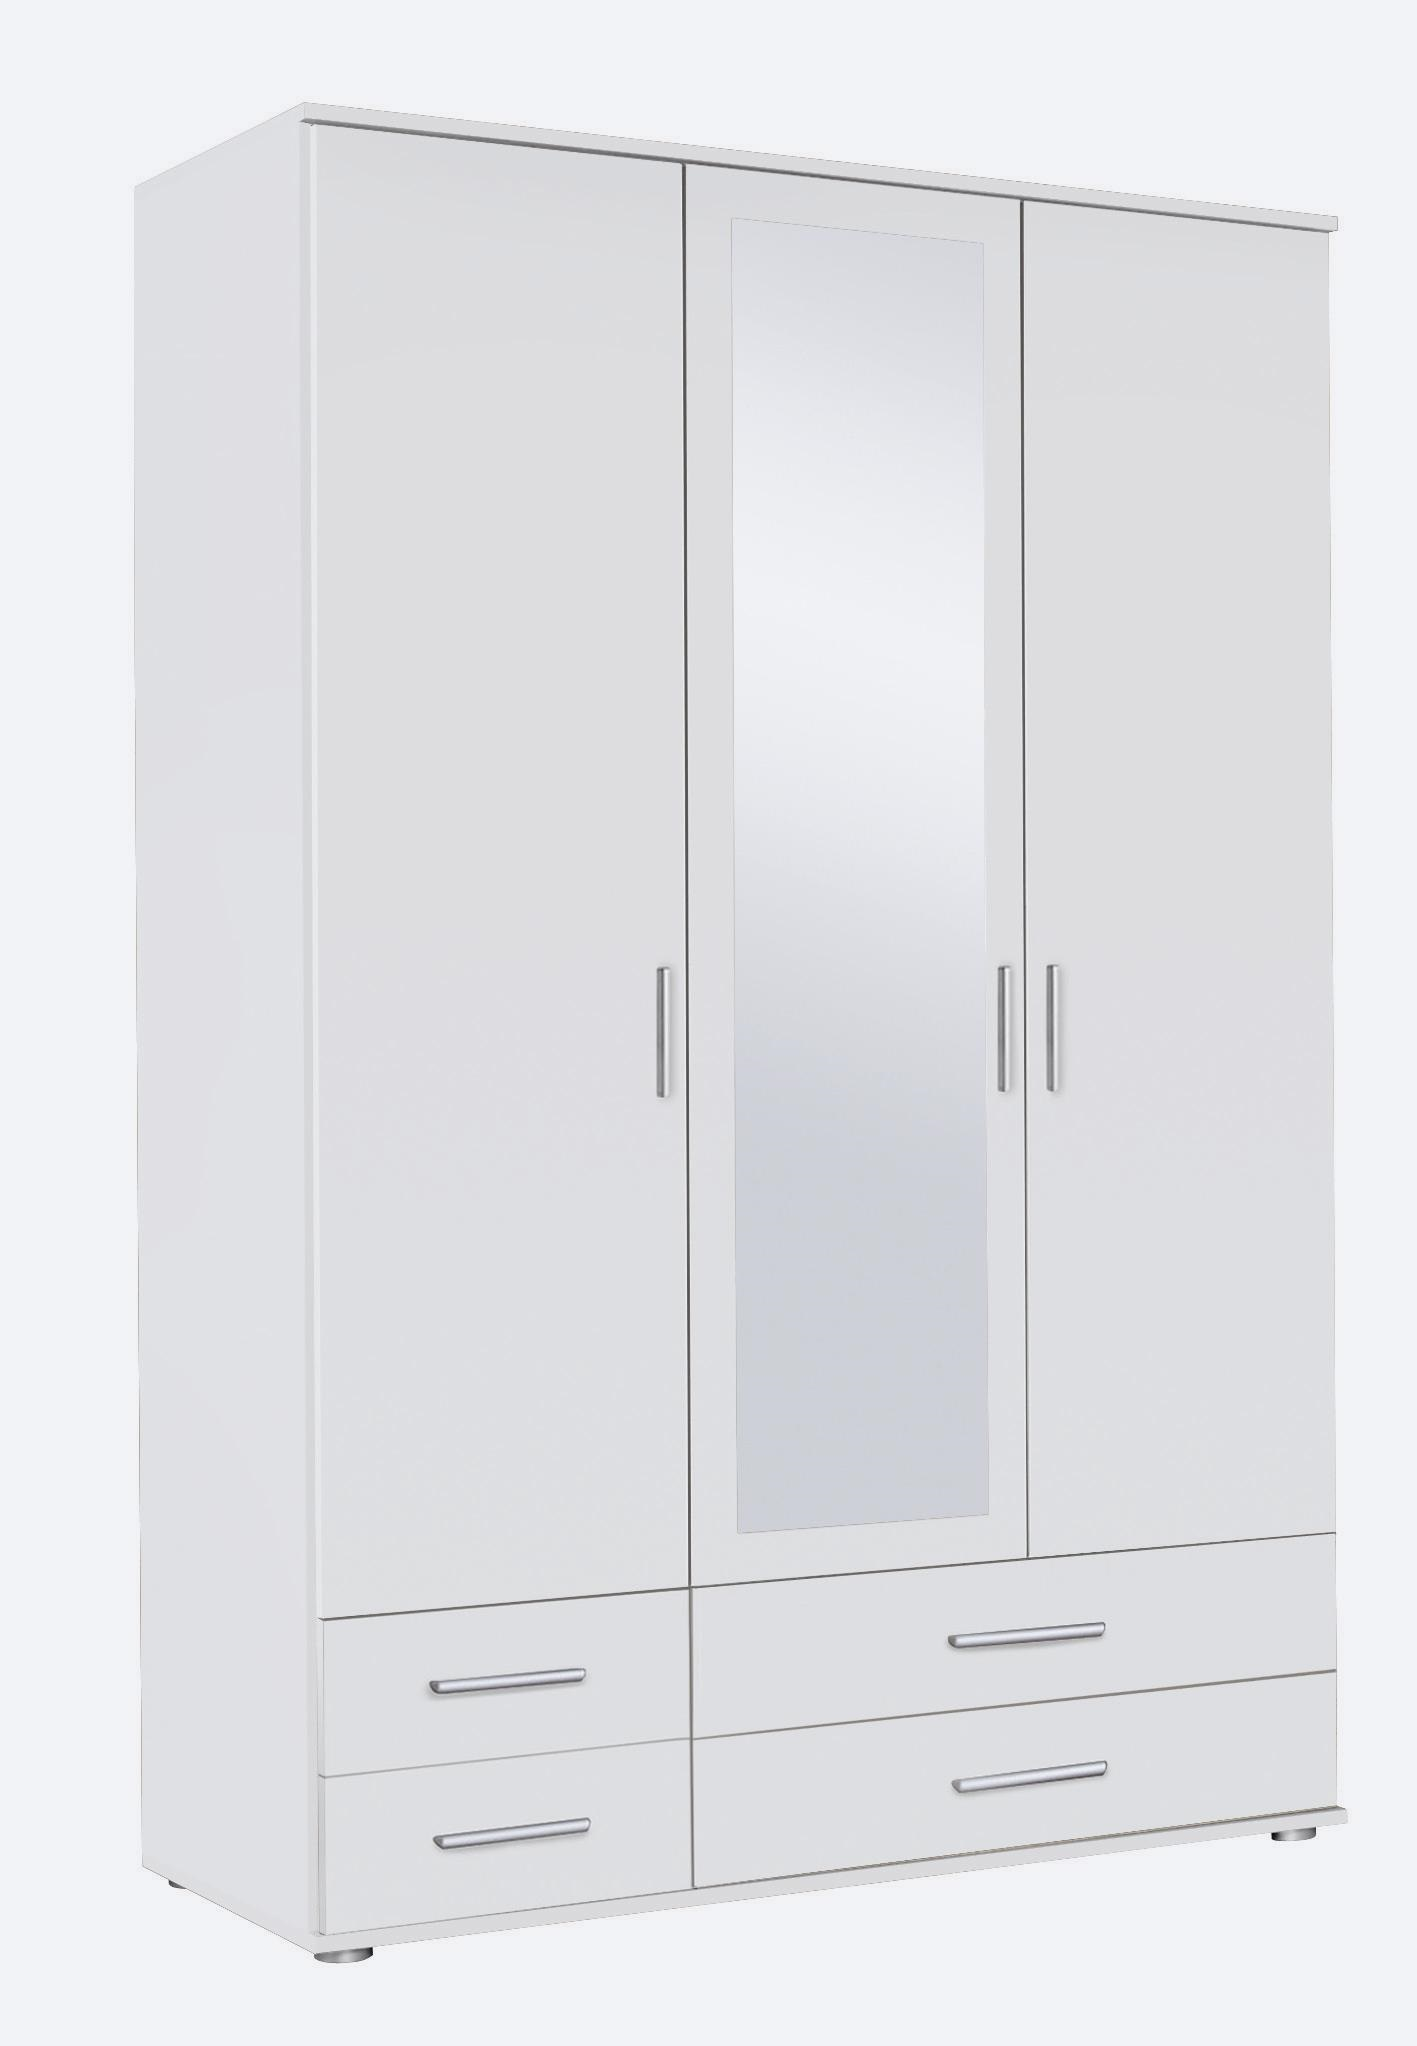 Armoire contemporaine 3 portes/4 tiroirs blanche Lazaro